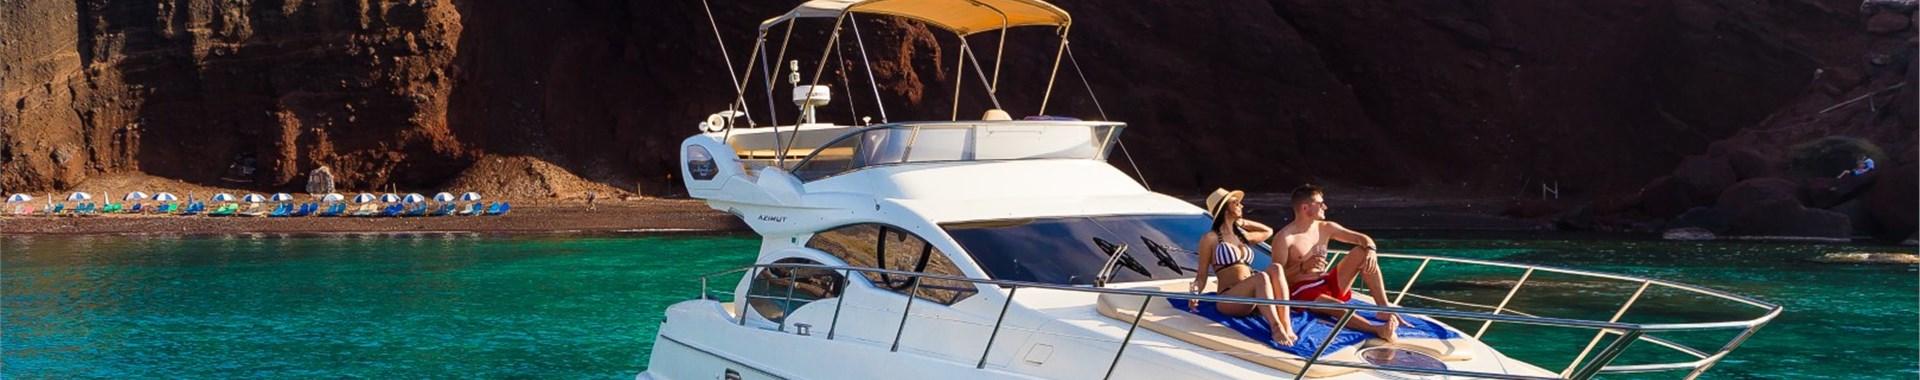 Private Boat Tours & Cruises in Santorini